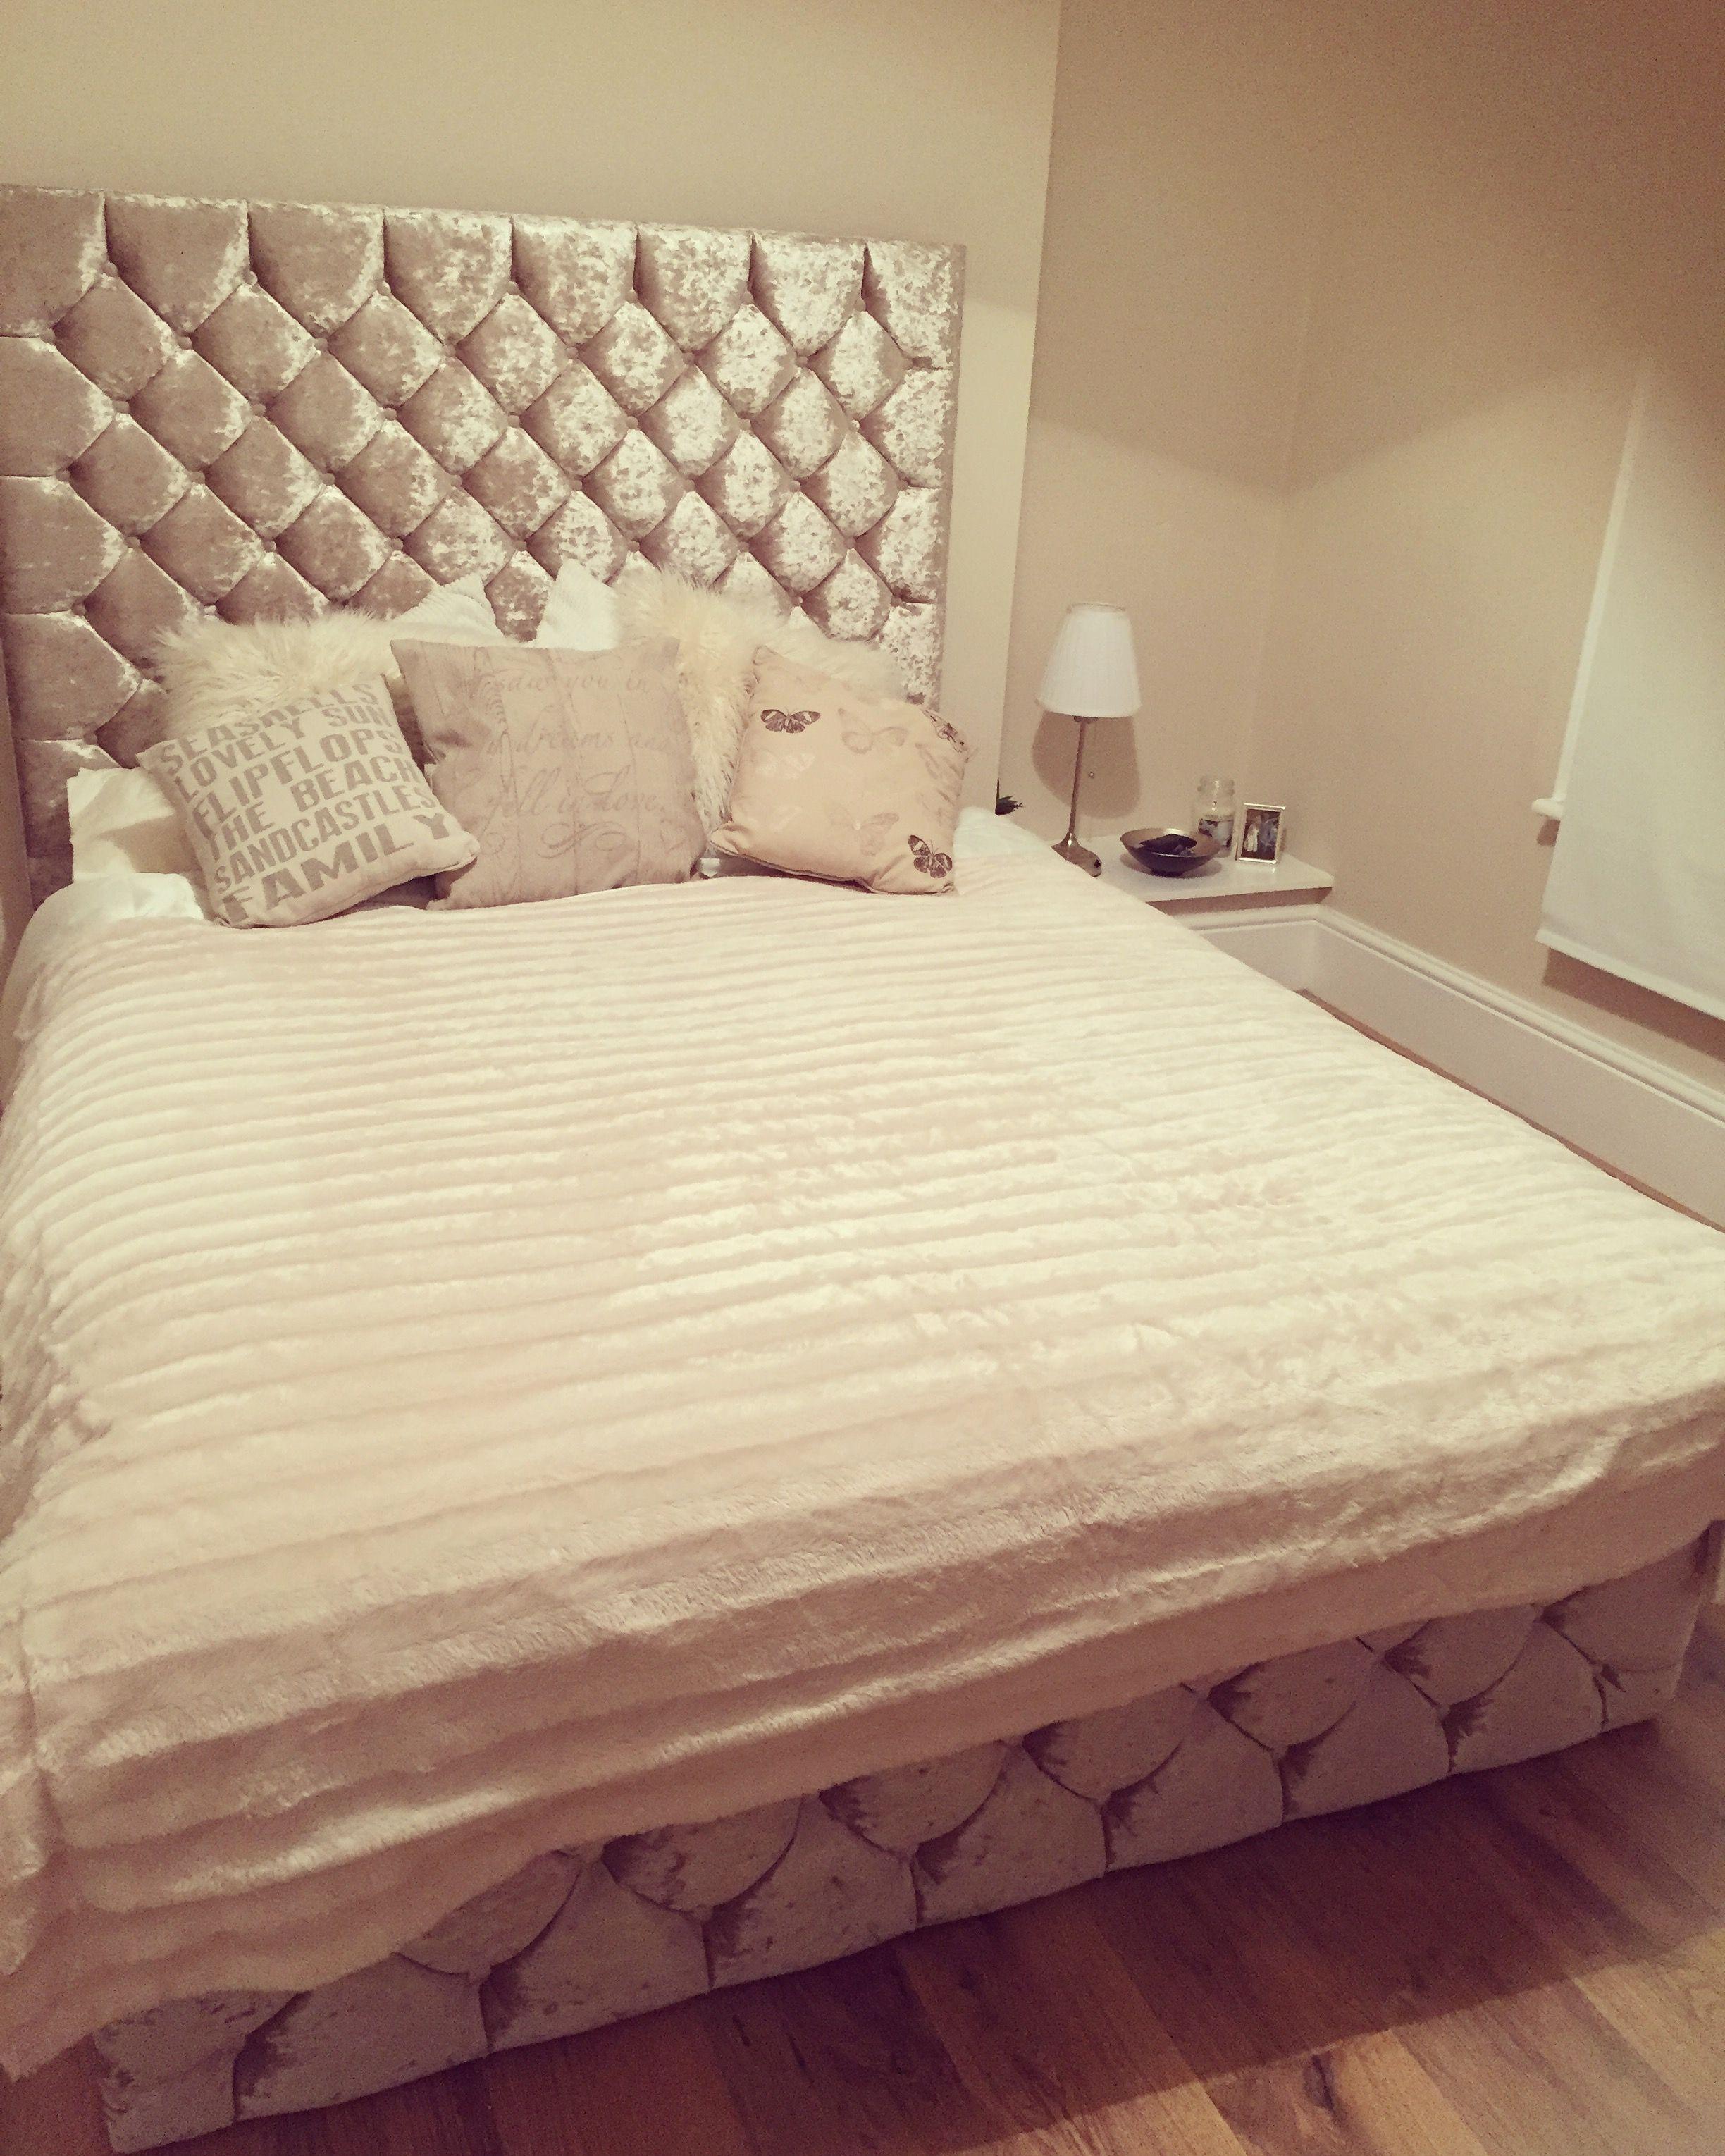 Crushed Velvet Cream Bed Pink Bedroom Decor Crushed Velvet Bedroom Ideas Crushed Velvet Bed